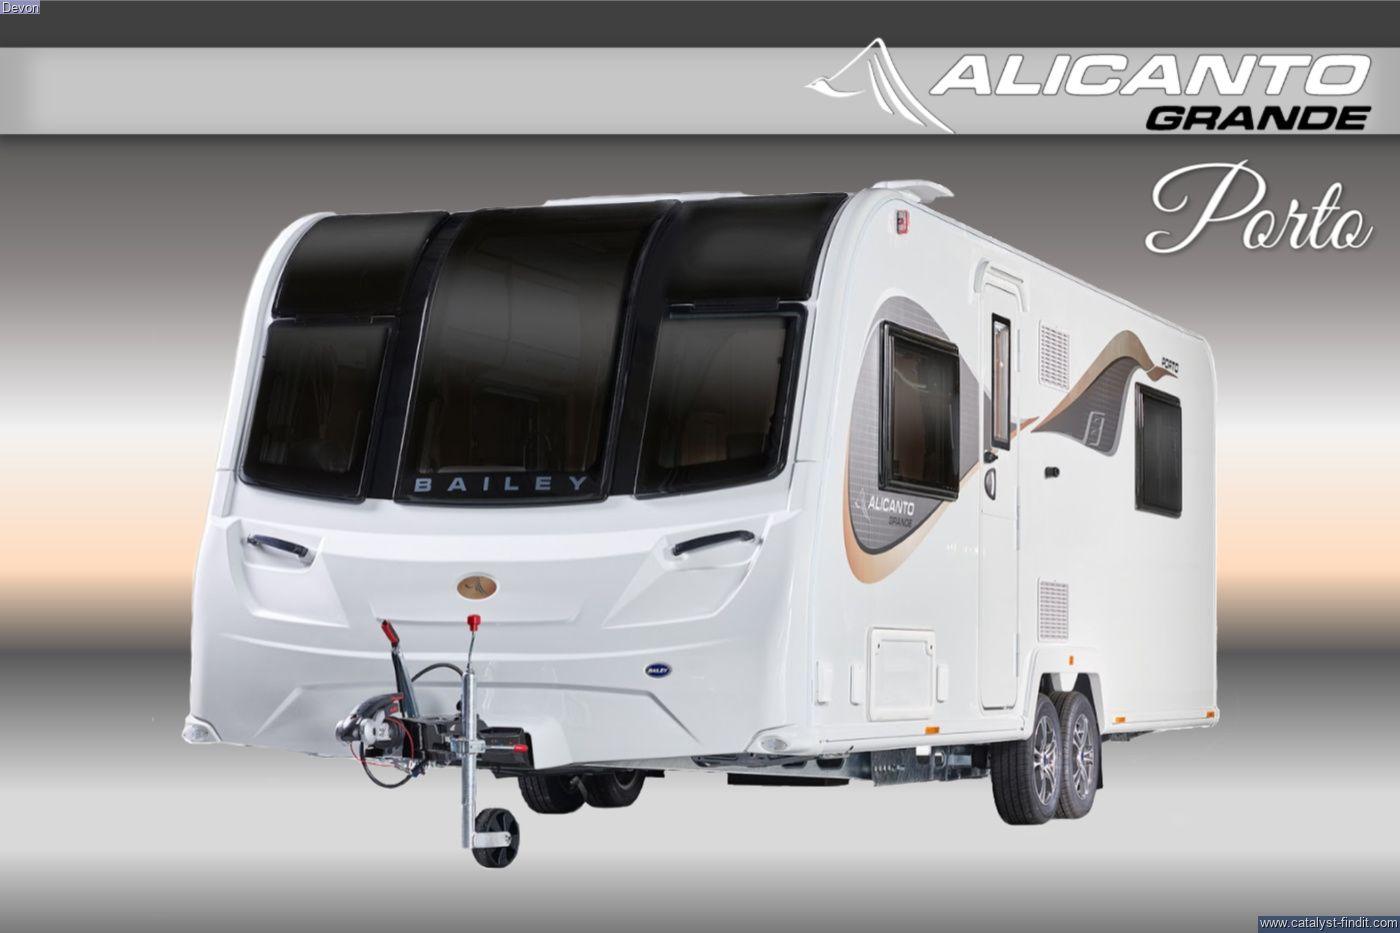 Bailey Alicanto Grande Porto 2021